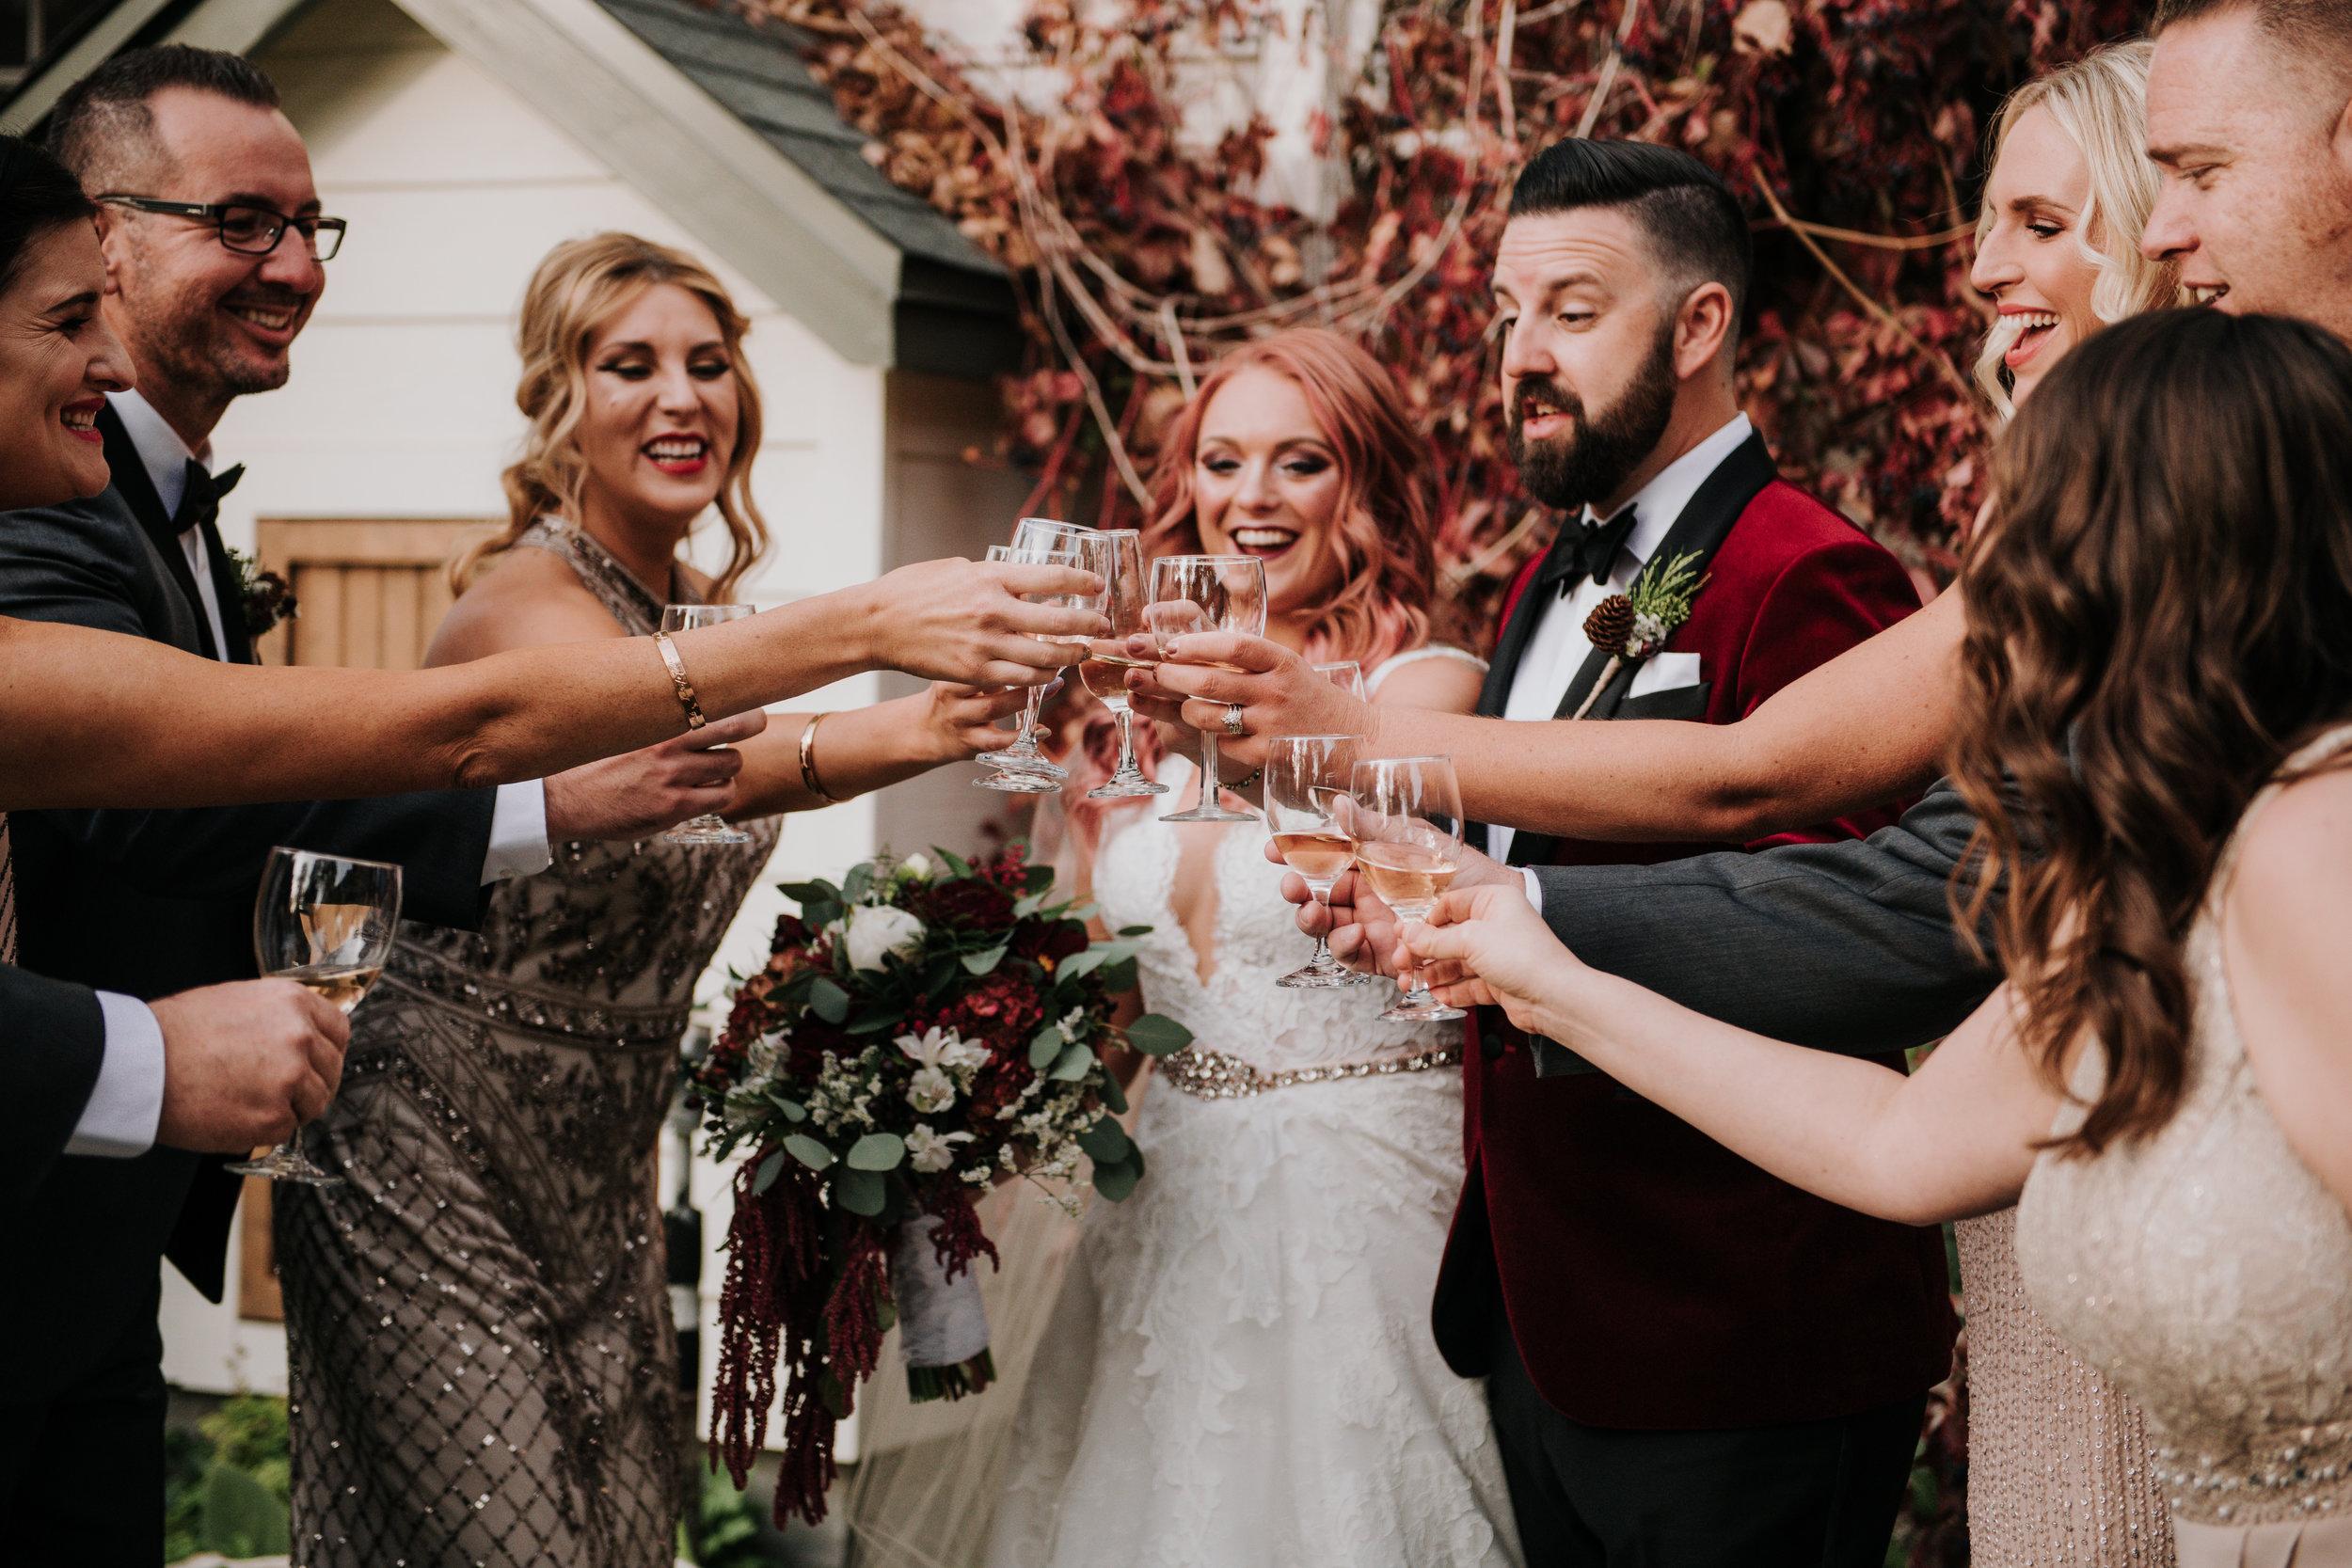 2018-11-04 Maresa and Nick - Married - Oak Glen-965.jpg